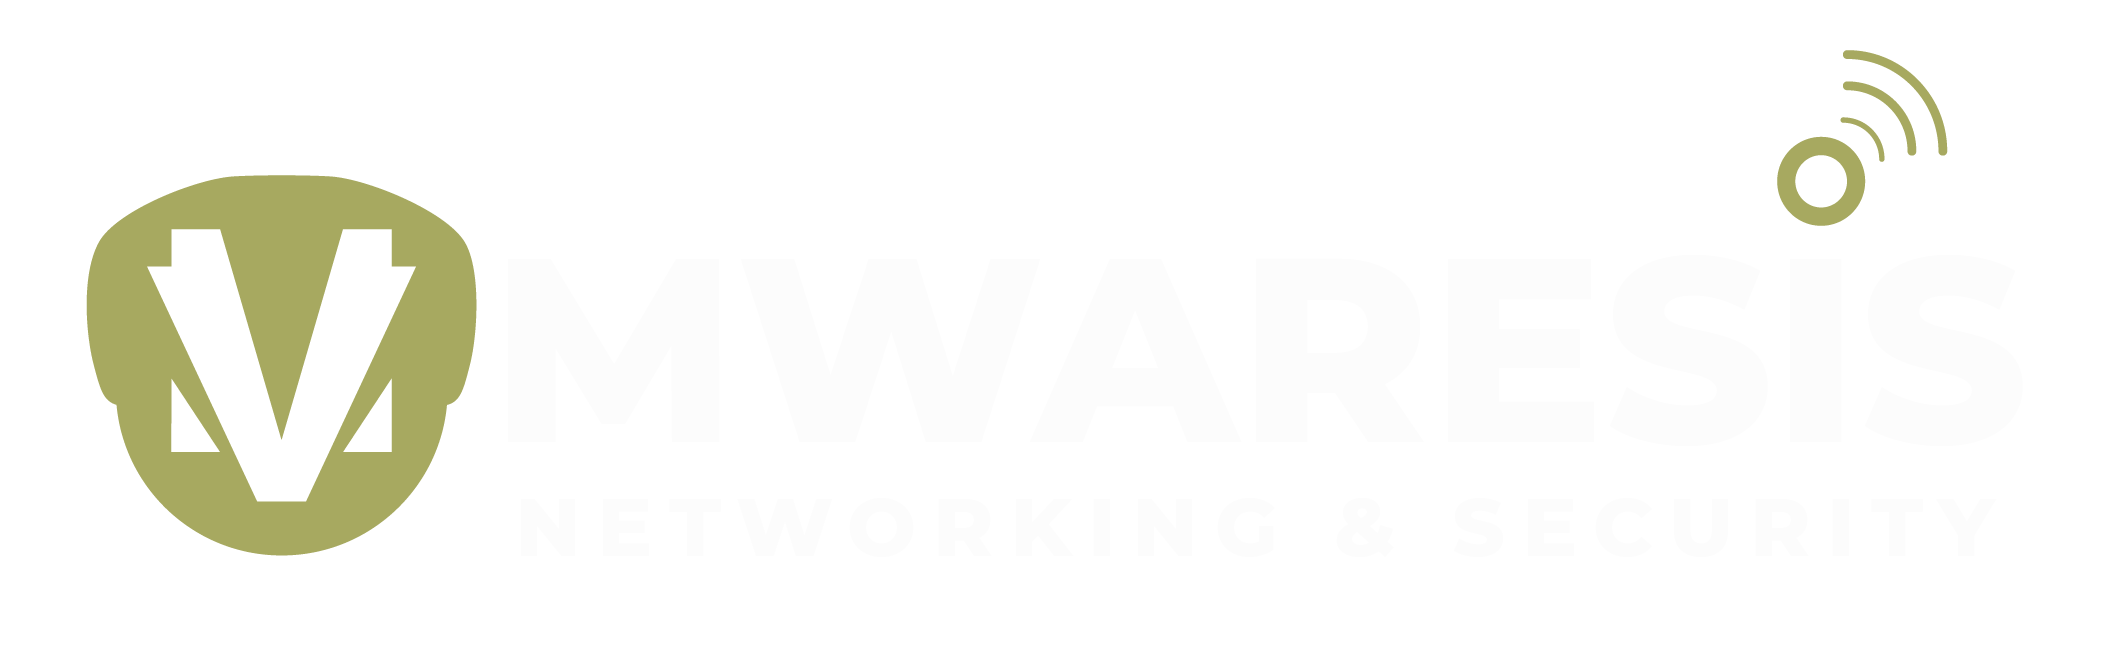 vmwaresis